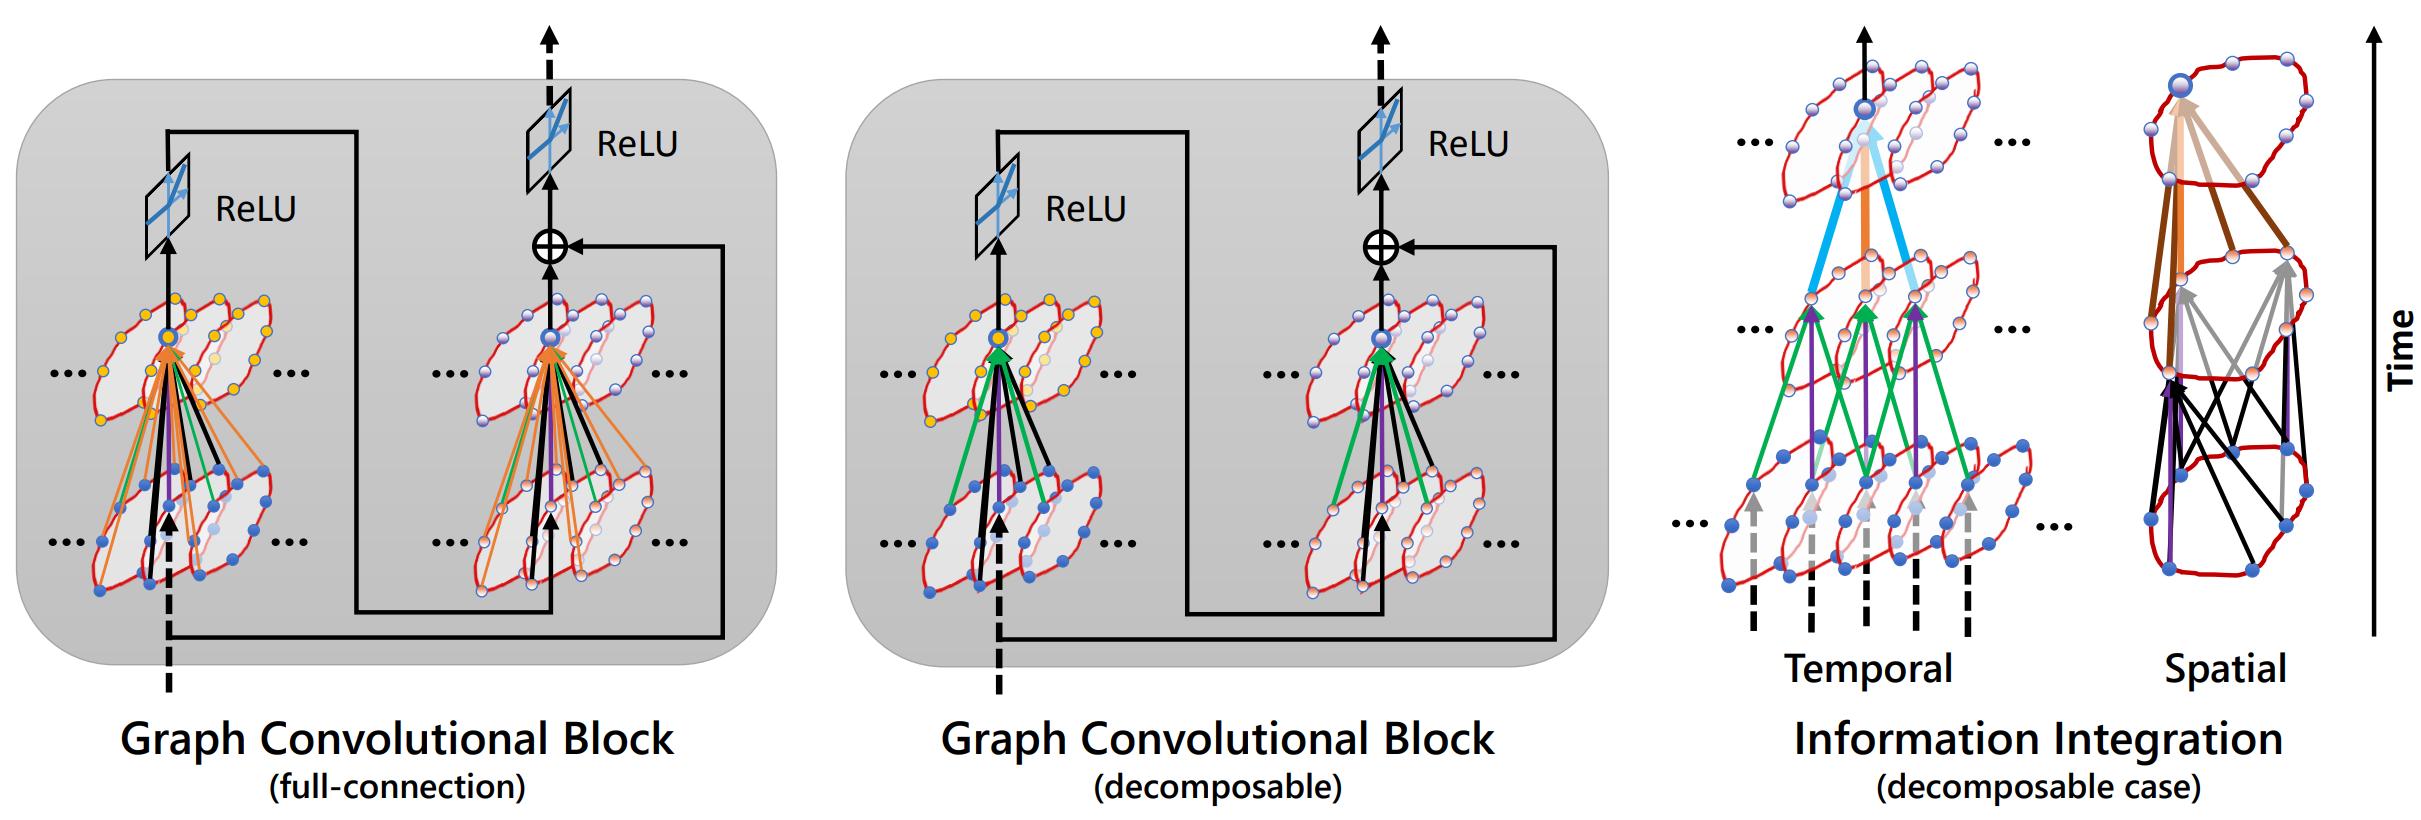 graph convolutional block